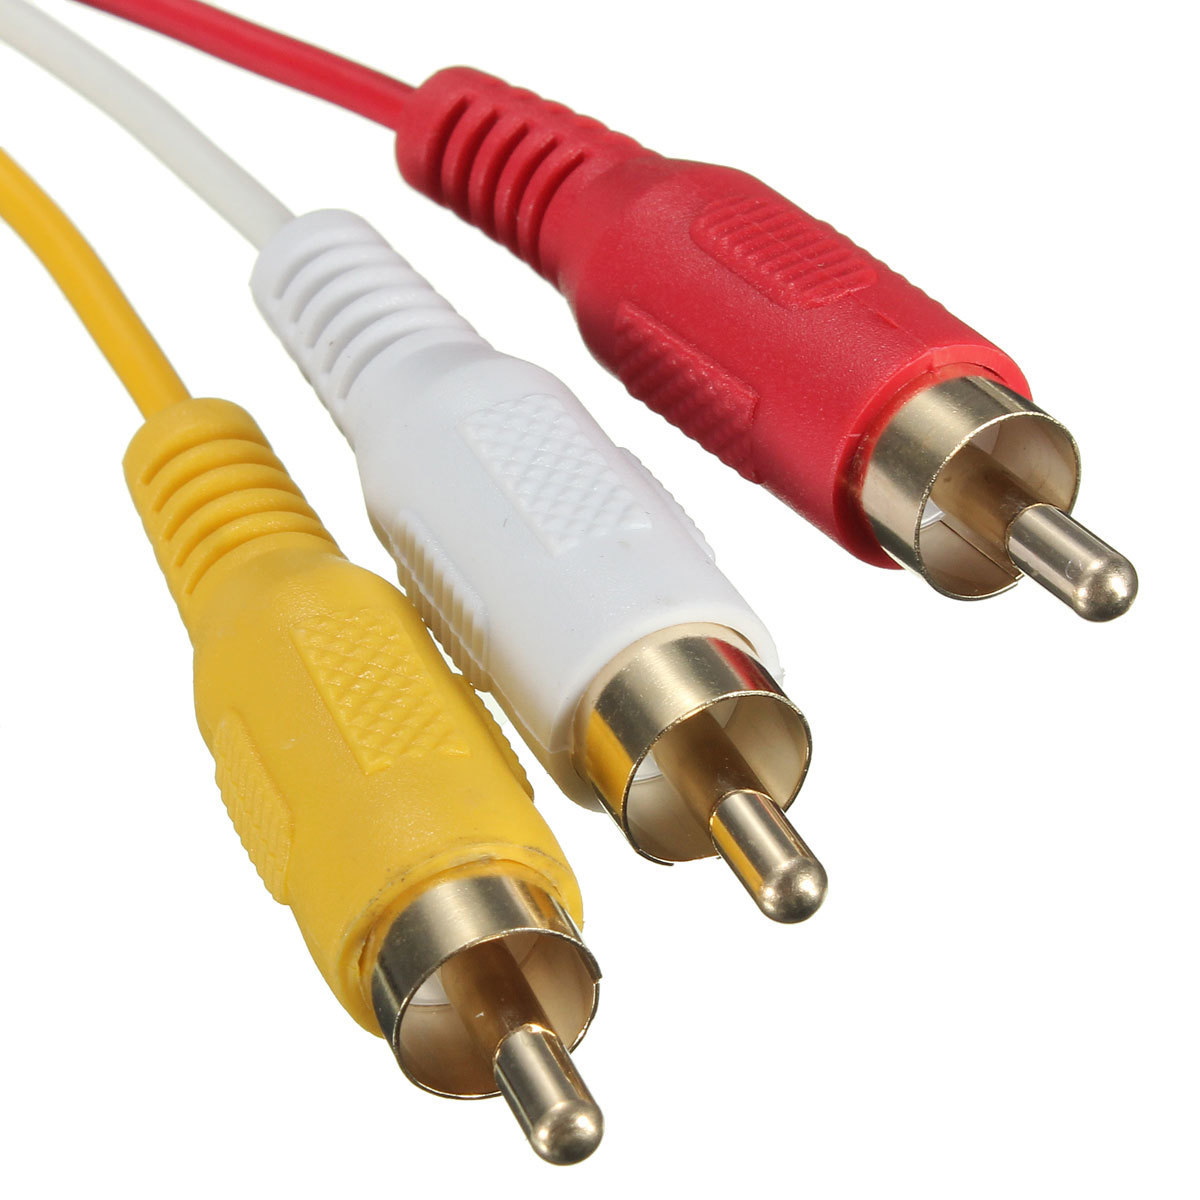 ... HDMI Male untuk 3 RCA dari konverter audio video adaptor HDTV kabel komponen AV 1.5 m ...